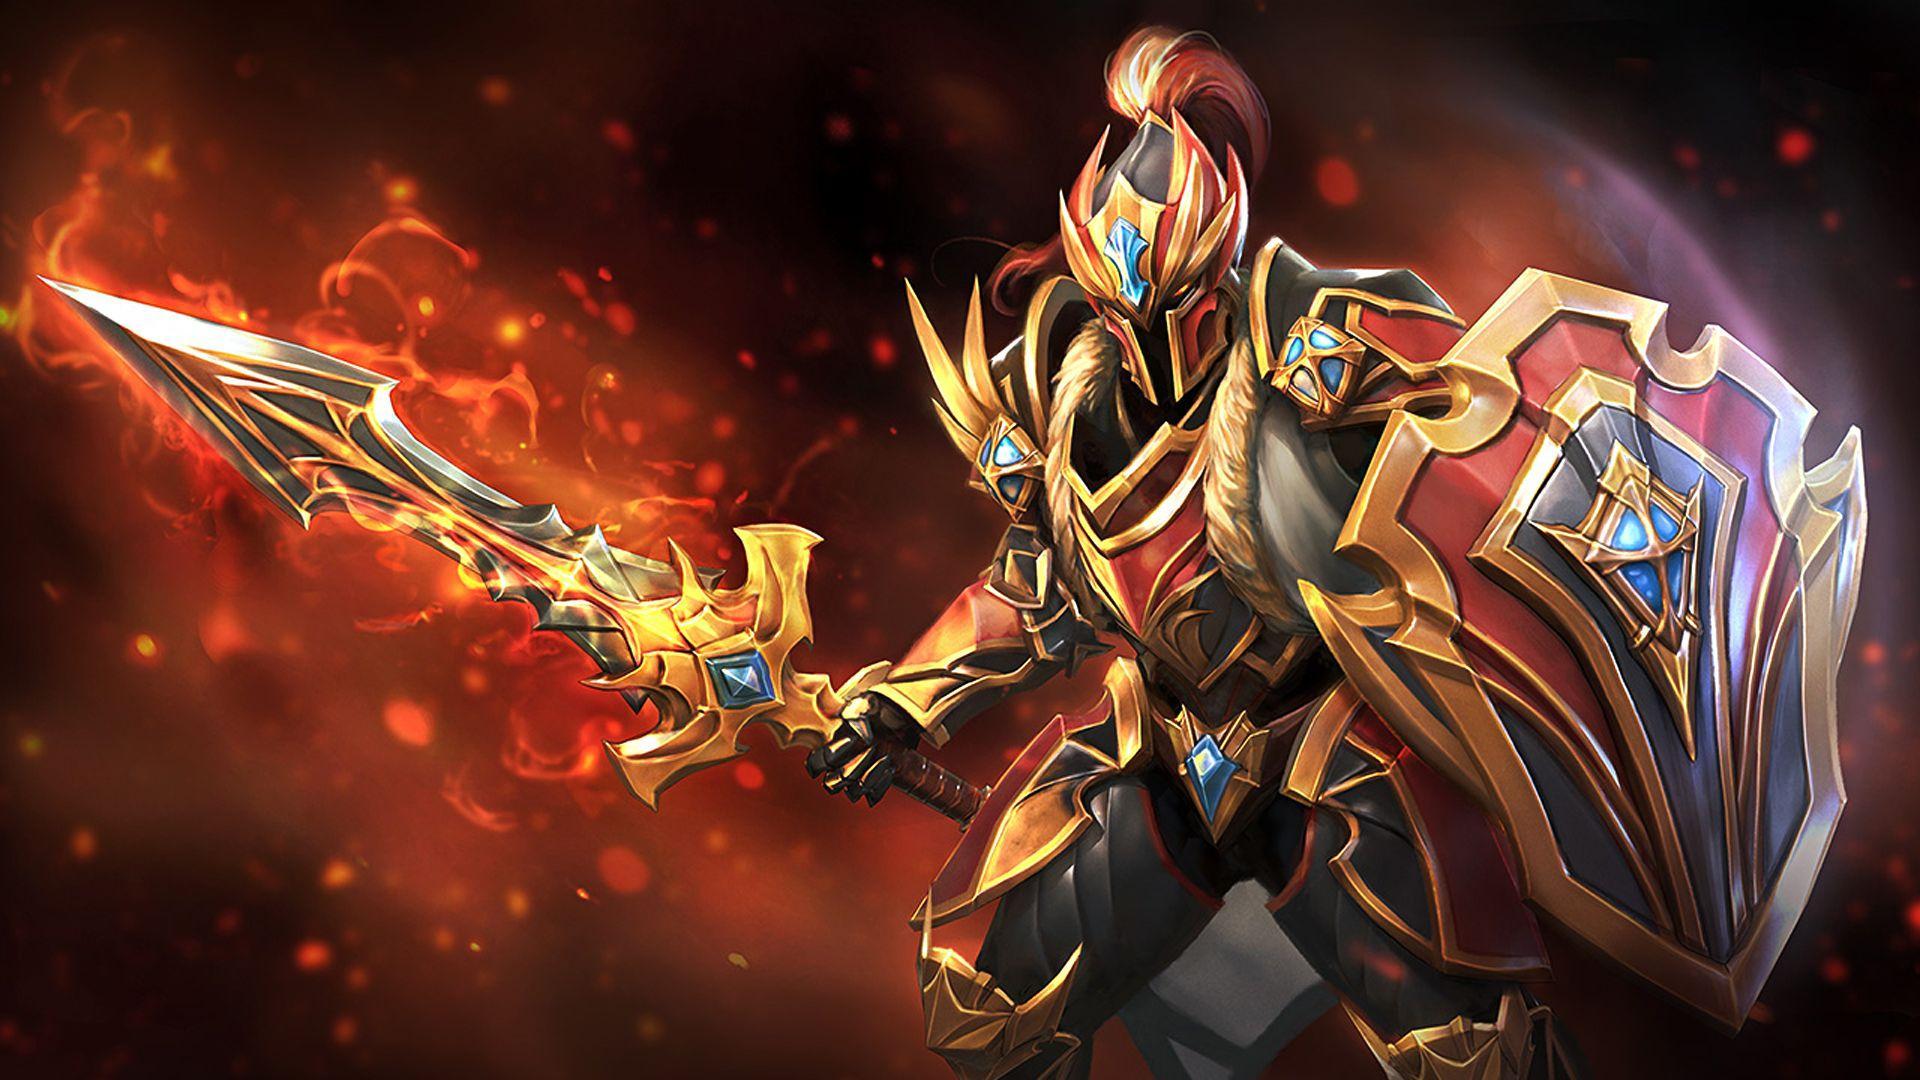 Dragon Knight Wallpapers Top Free Dragon Knight